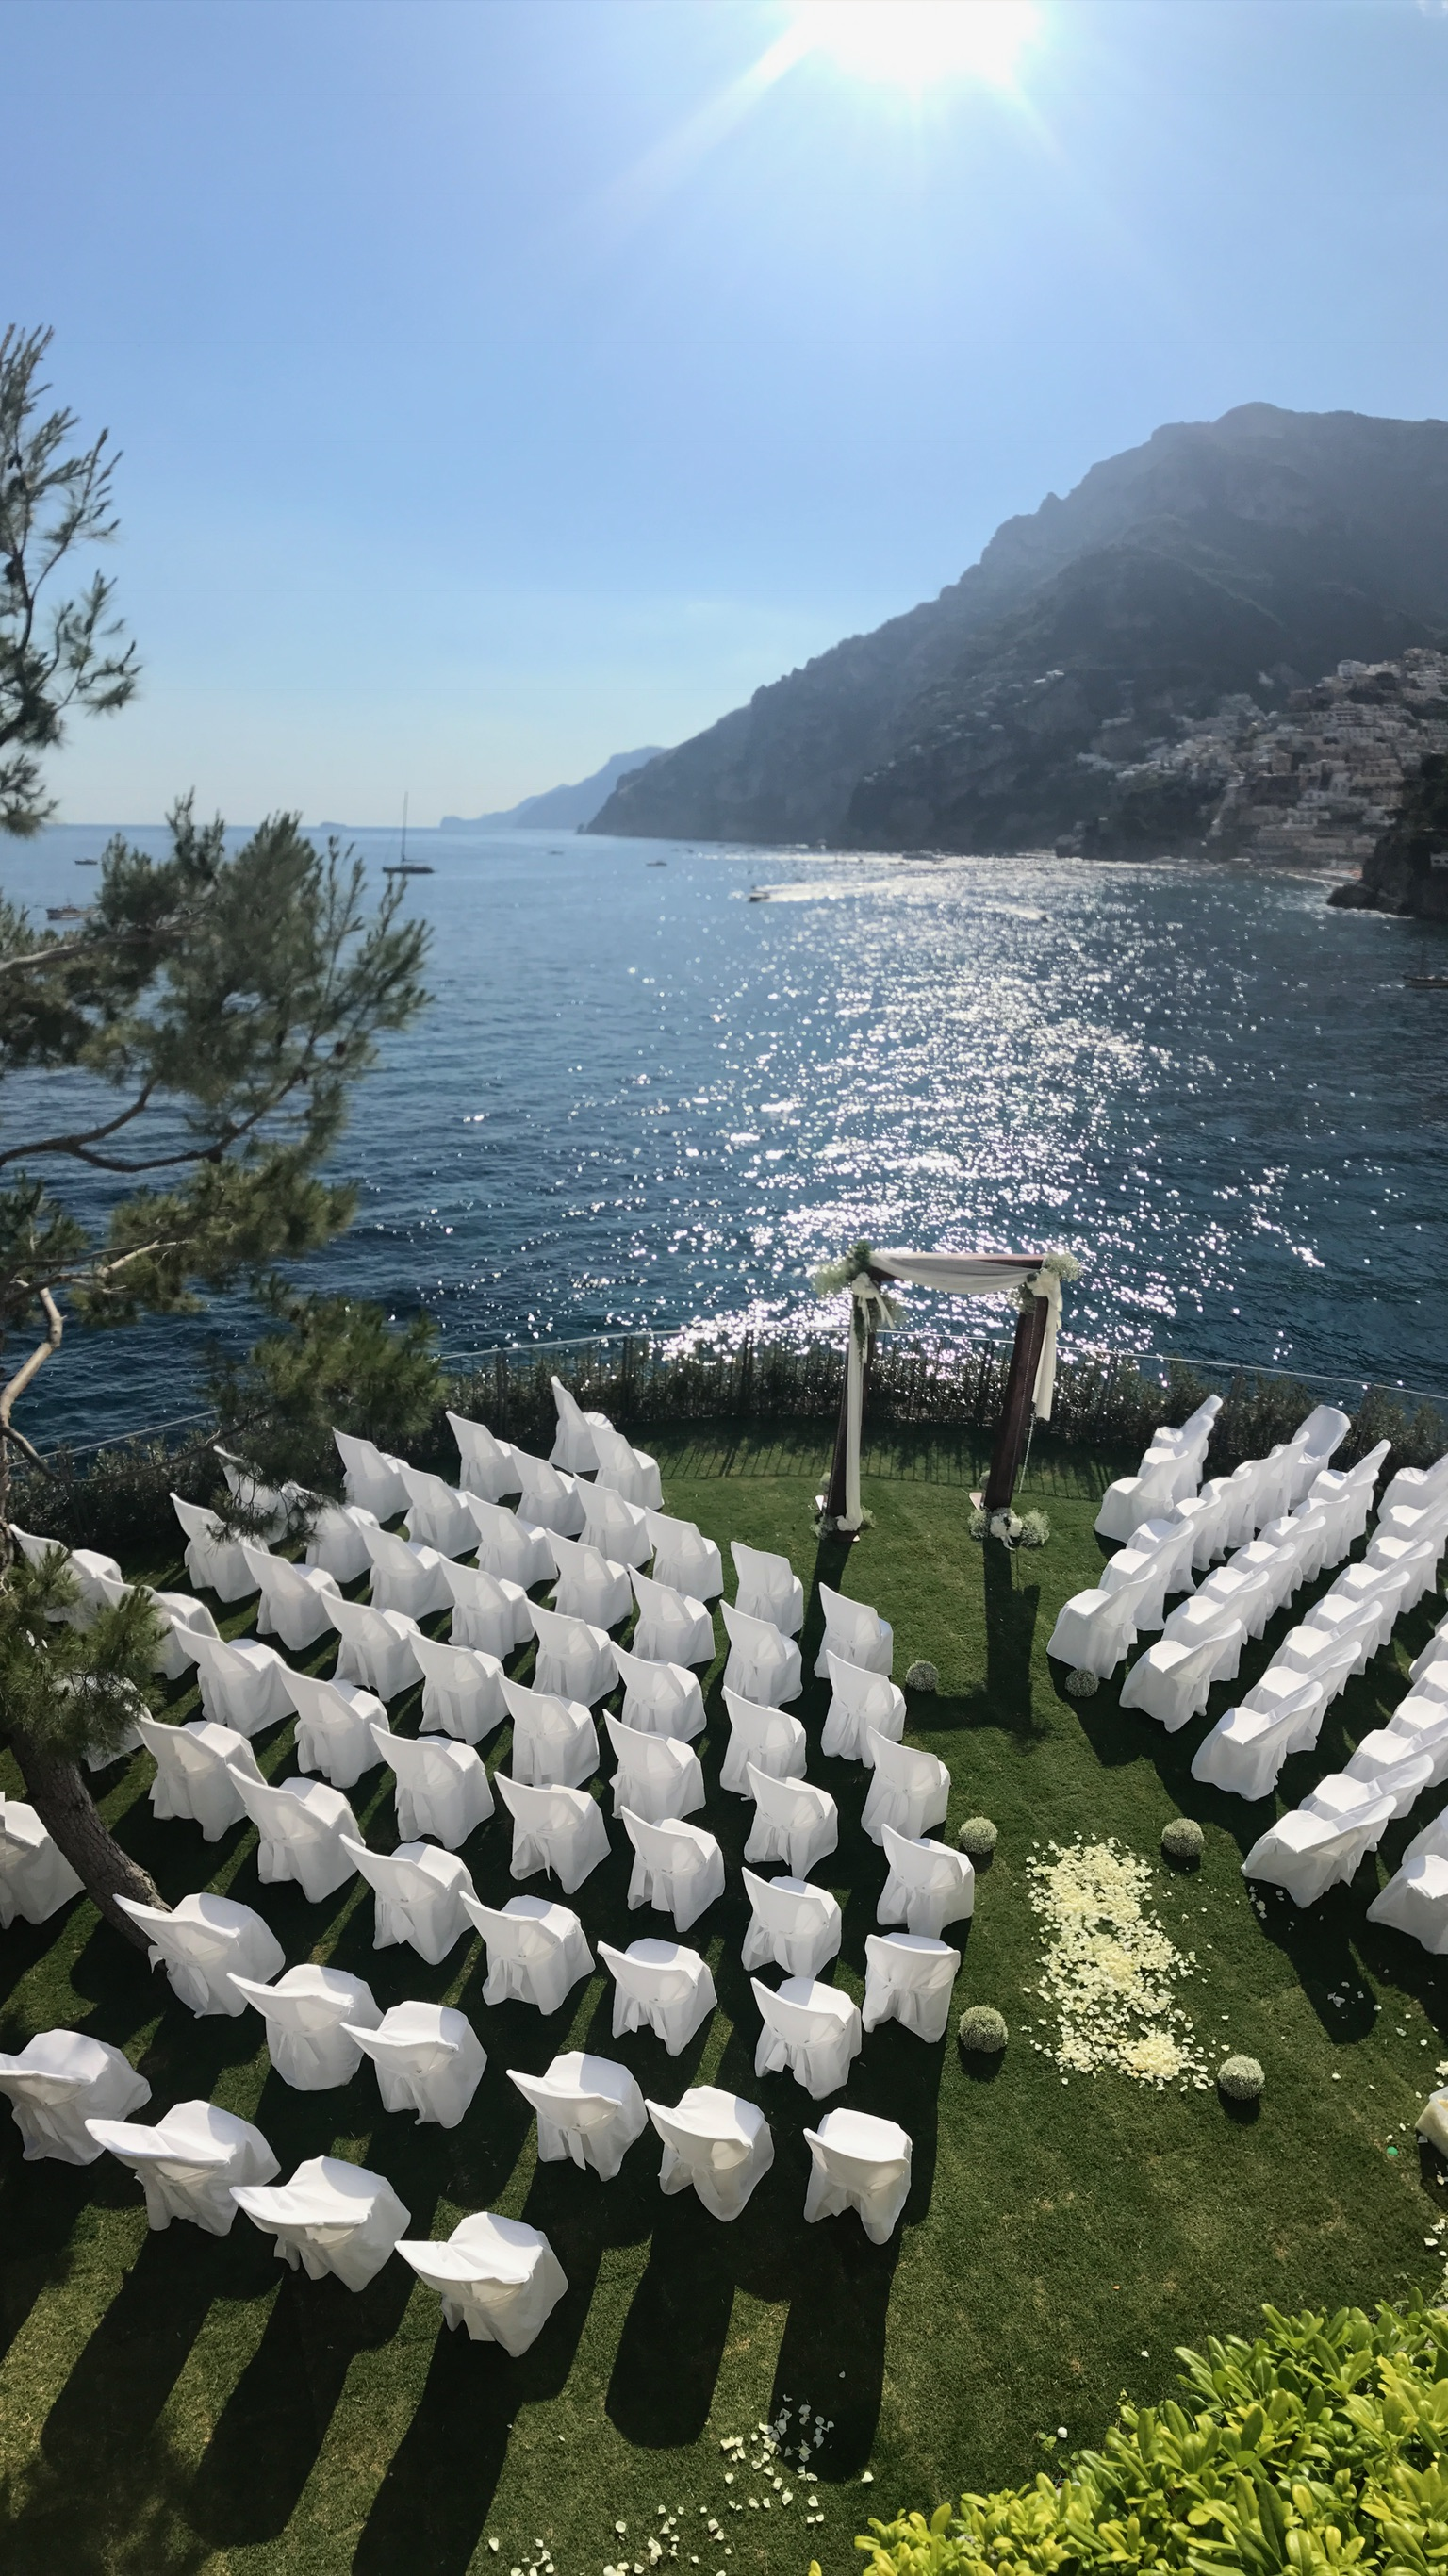 https://www.weddingamalfi.com/wp-content/uploads/Nathalie-and-Benjamin-wedding-in-Positano-20.jpg